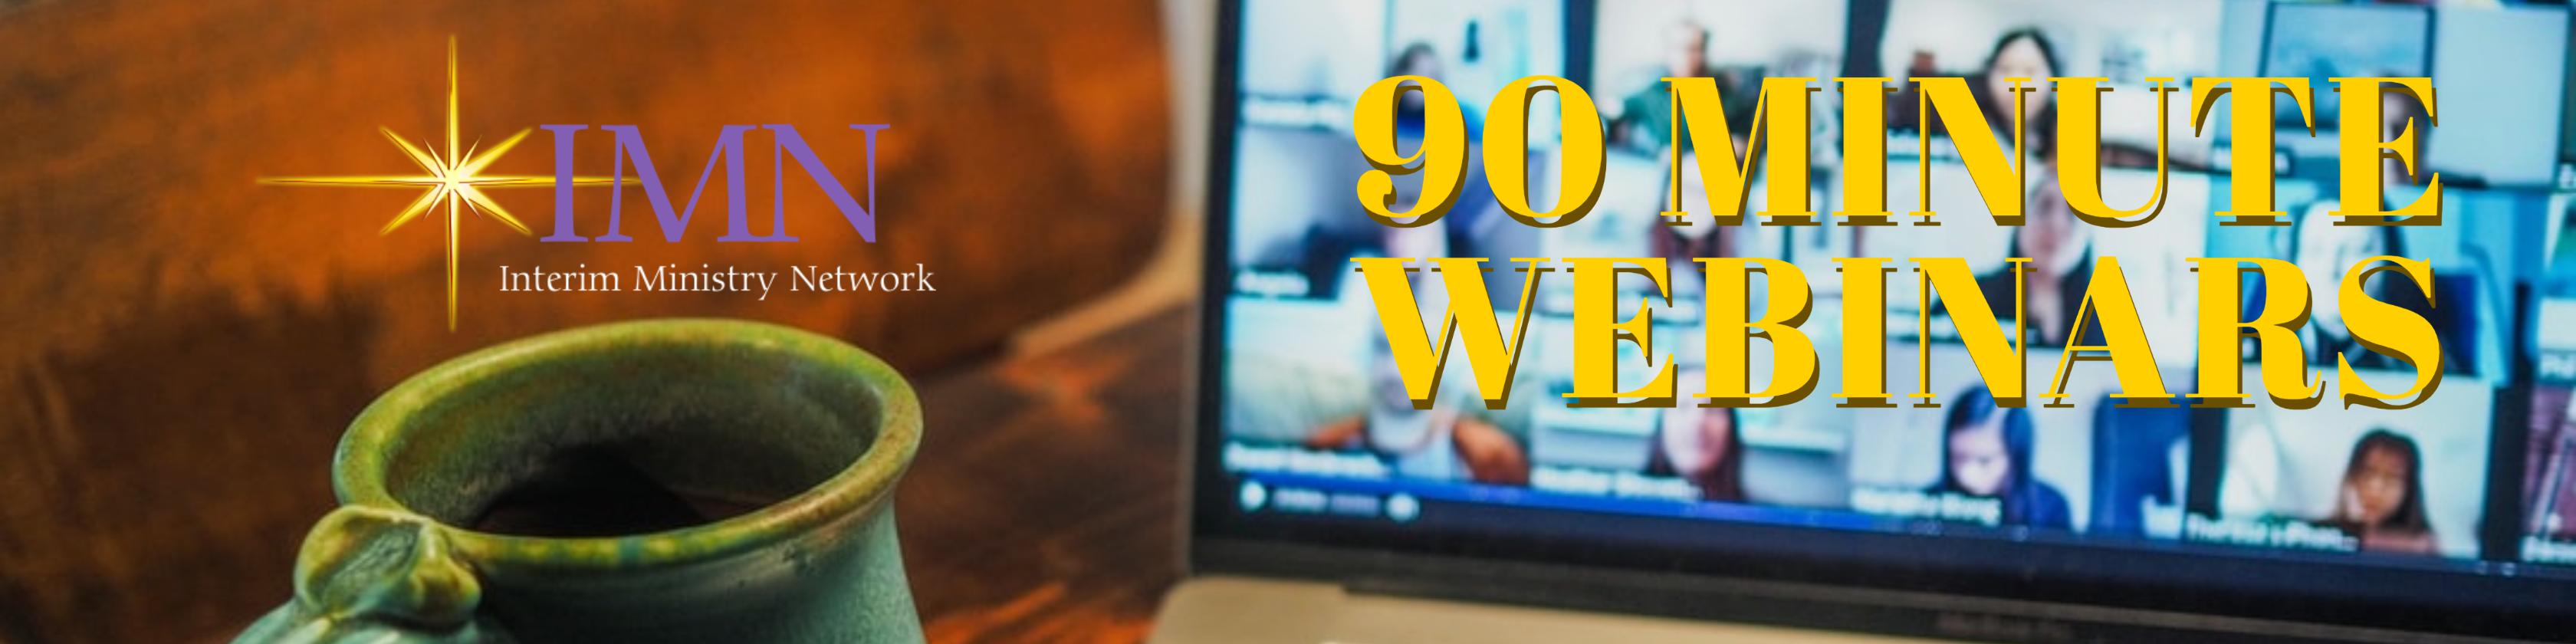 IMN 90 Minute Webinars